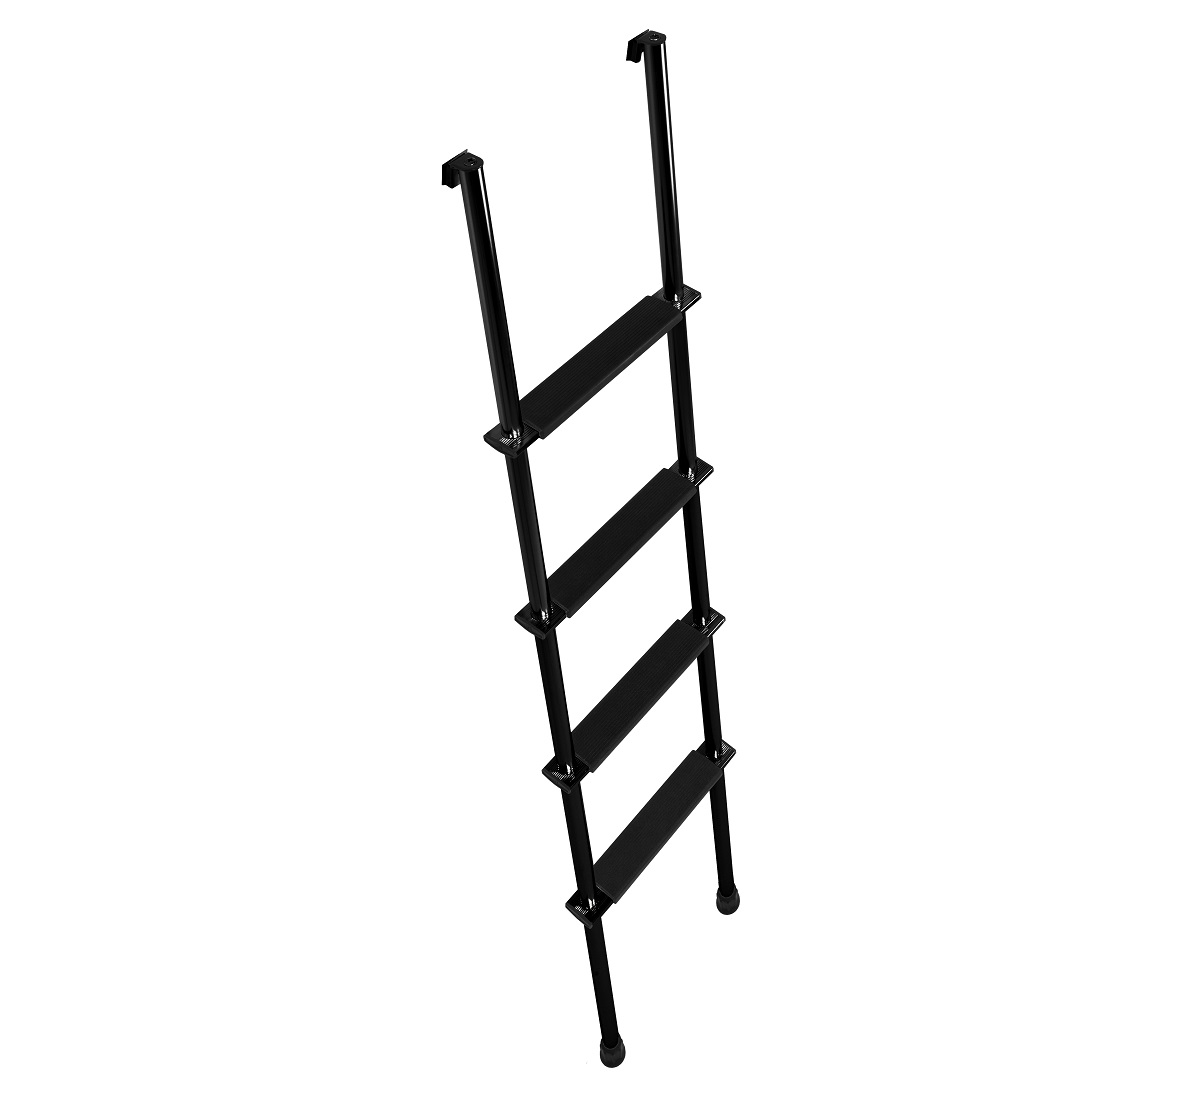 60 Interior Bunk Ladder For Rv